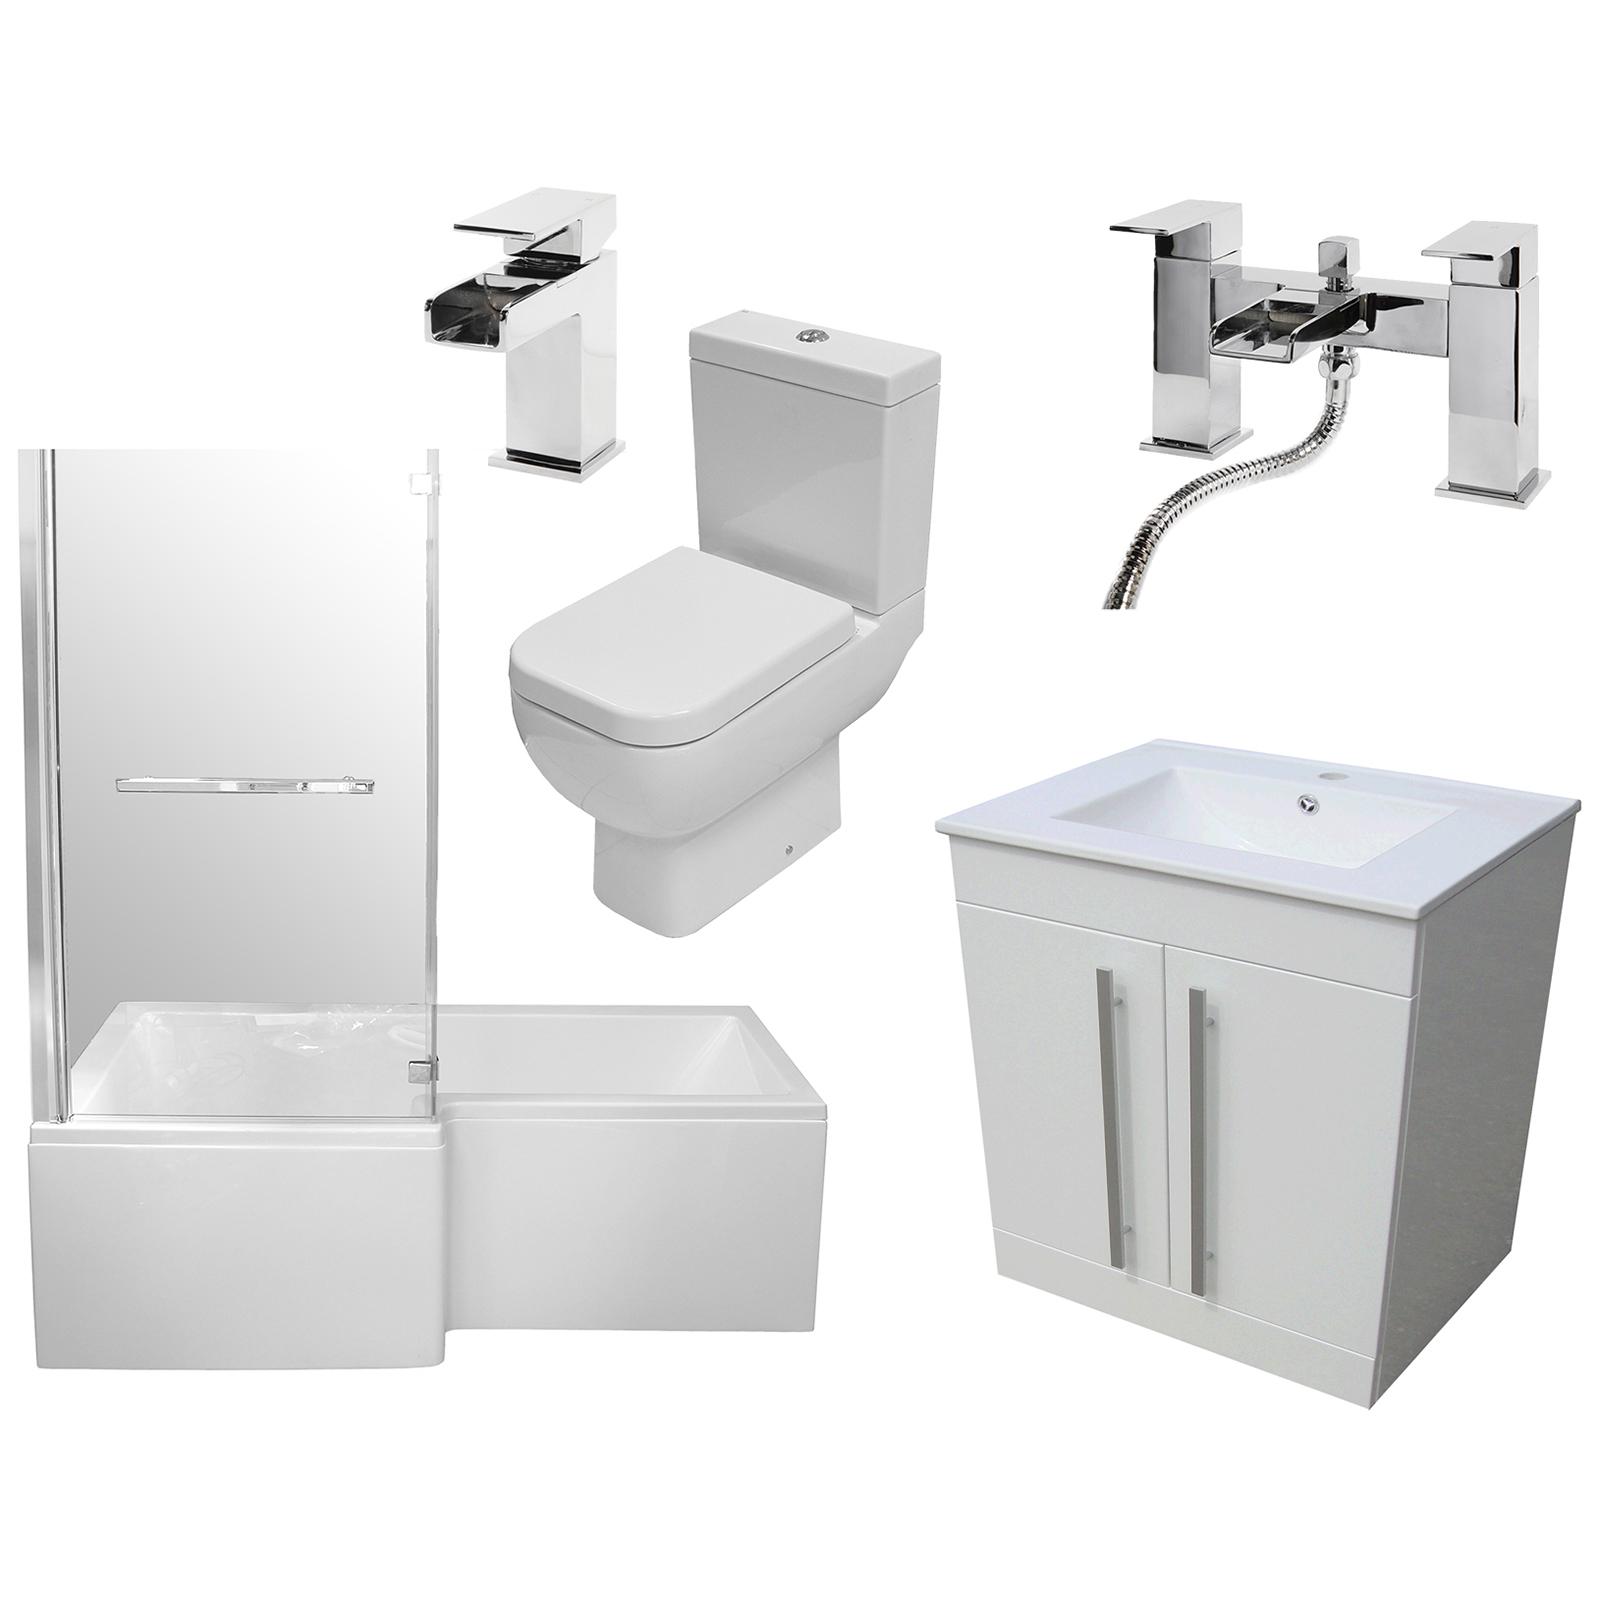 Allbits Square Shower Bath Vanity Suite LH £636.00 at Allbits ...